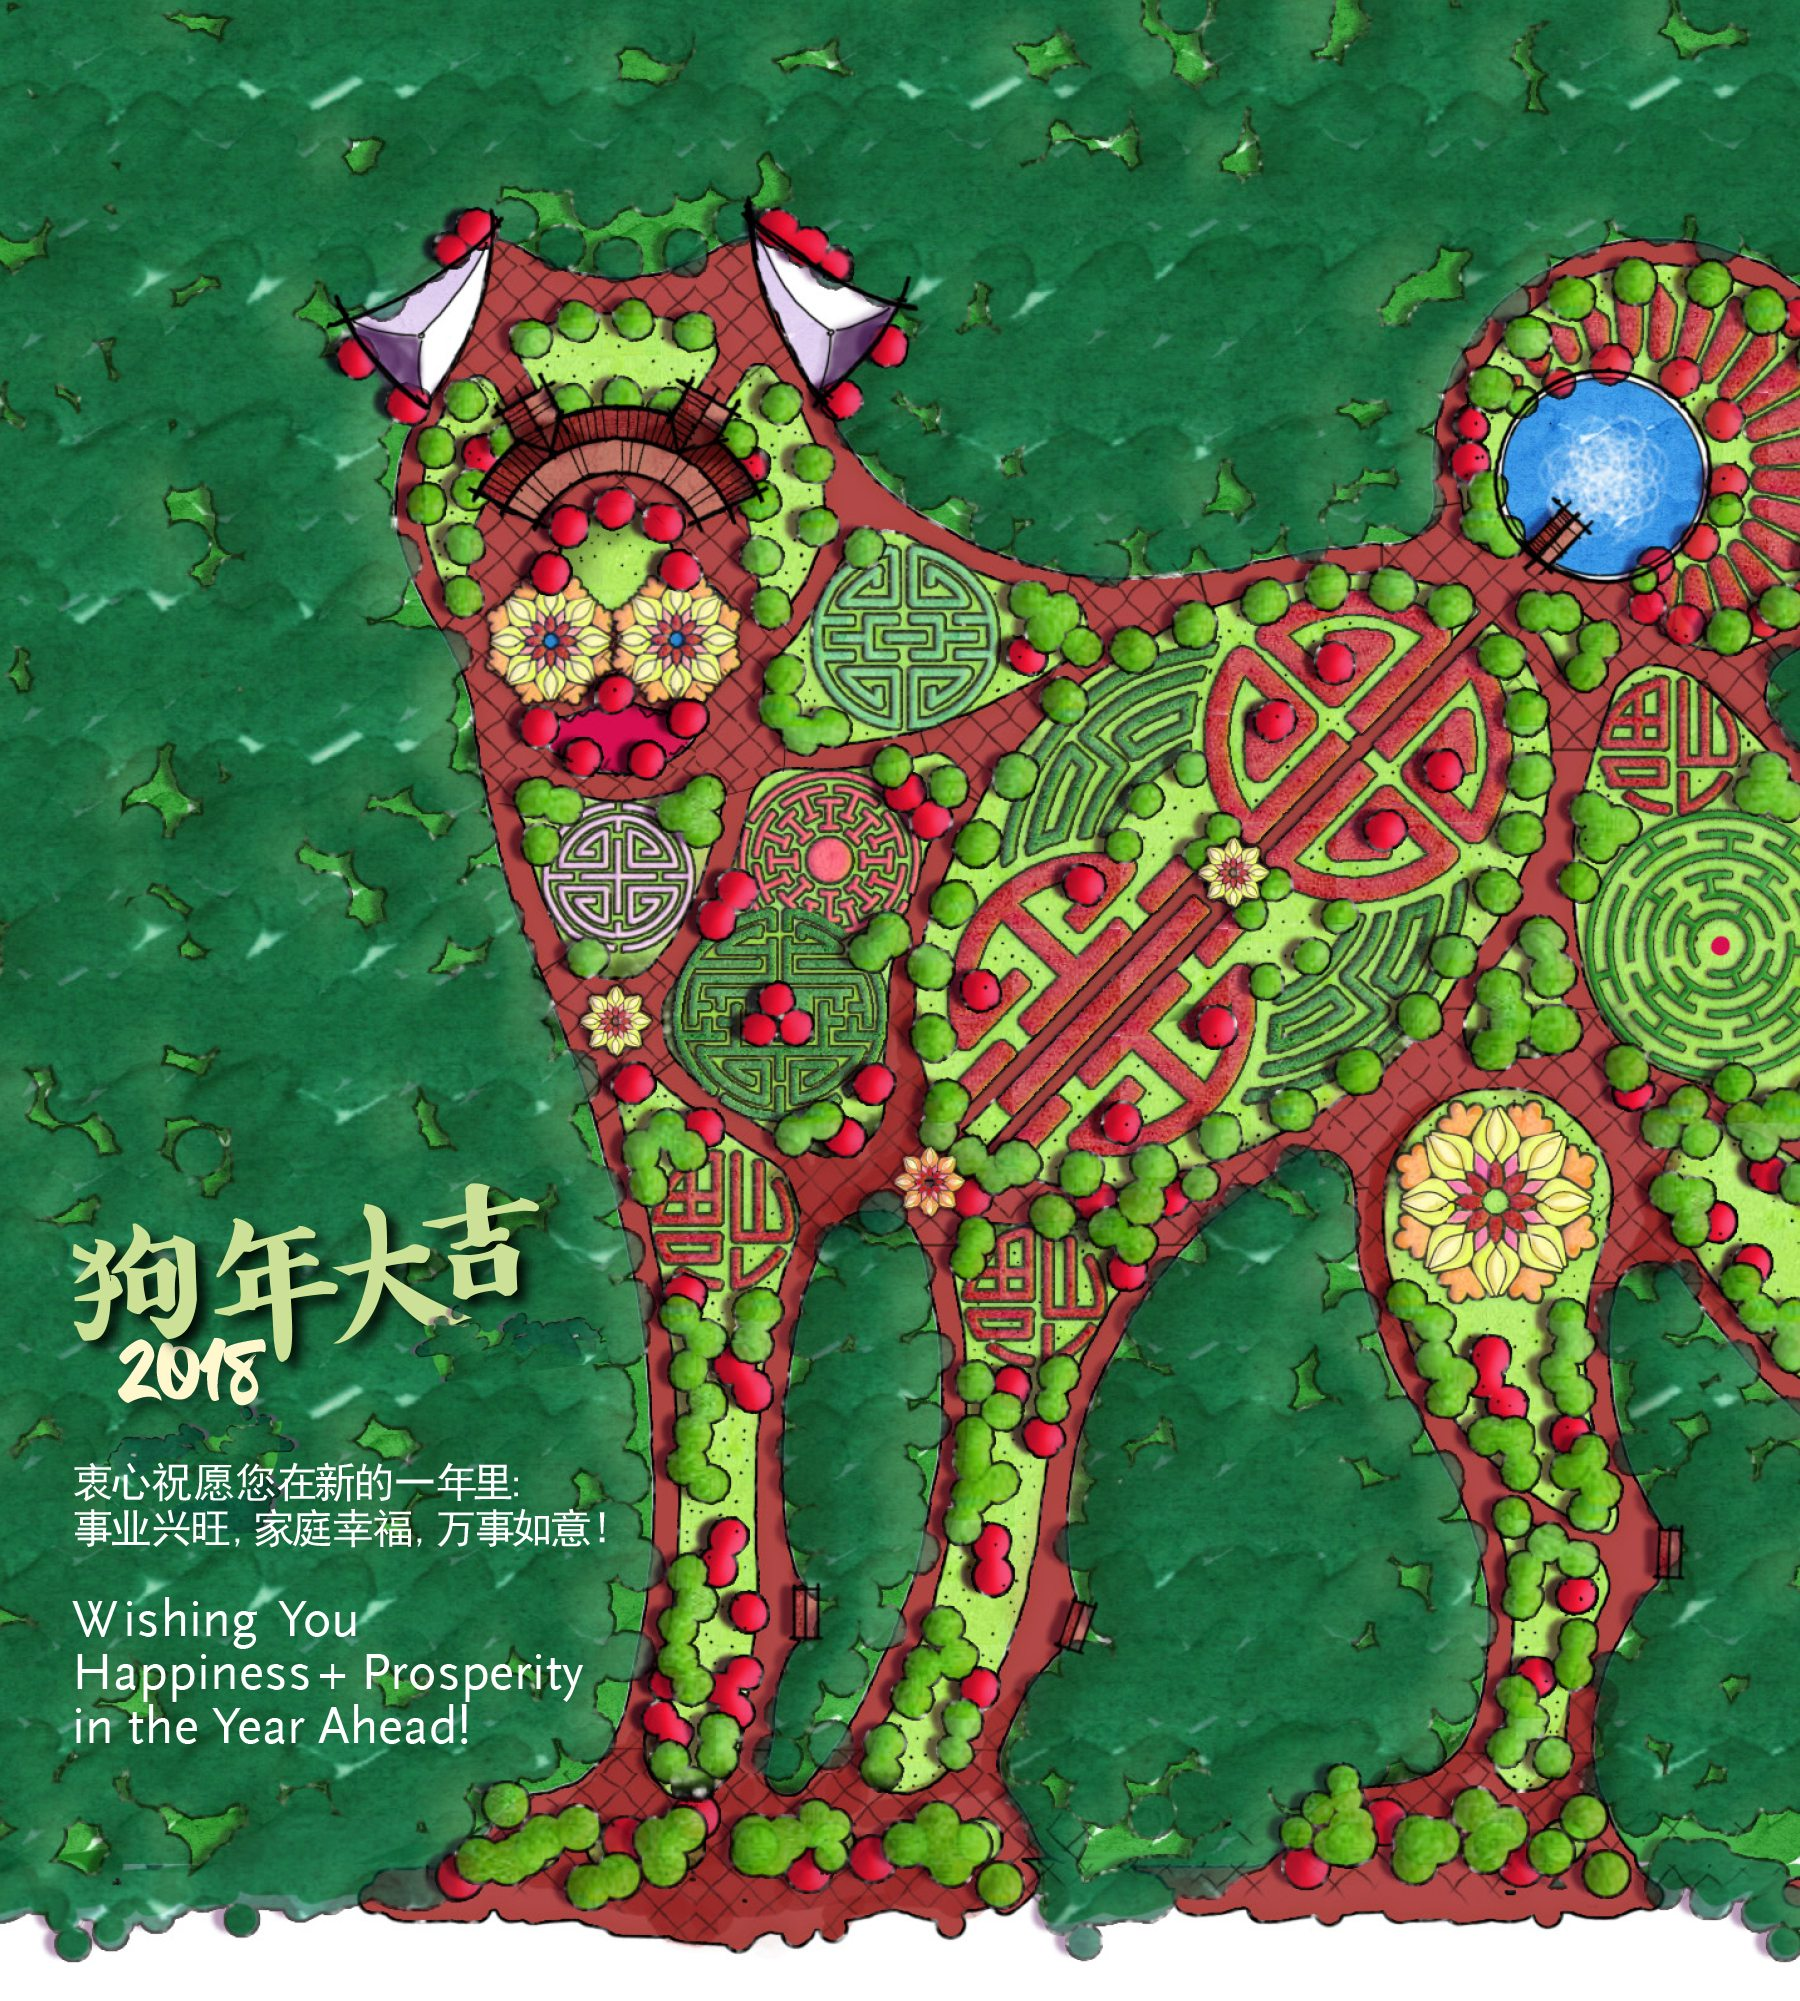 EKISTICS 2018 Chinese New Year + Bilingual Website